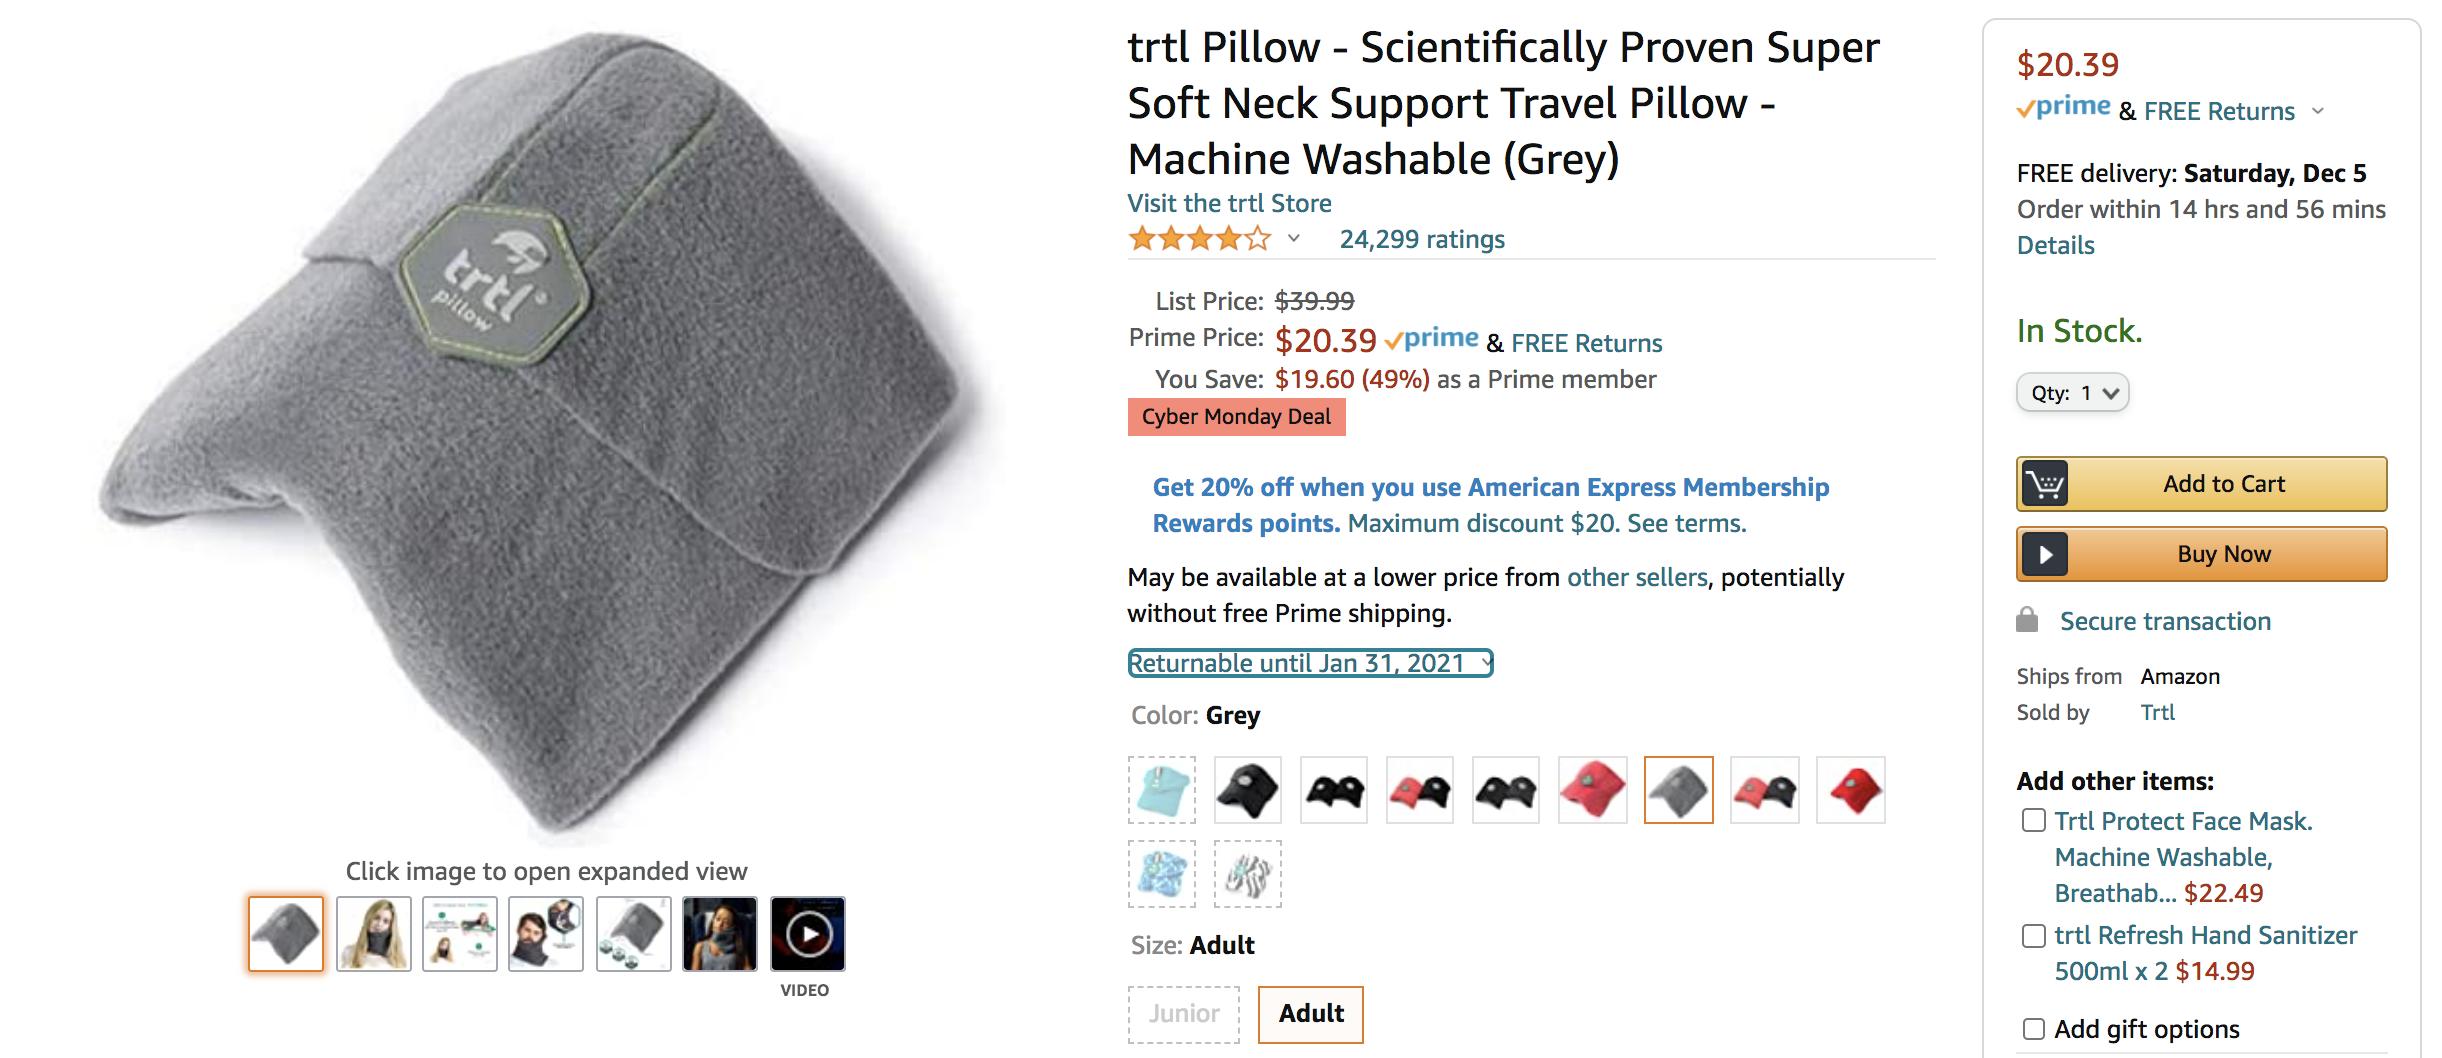 trtl travel pillow amazon